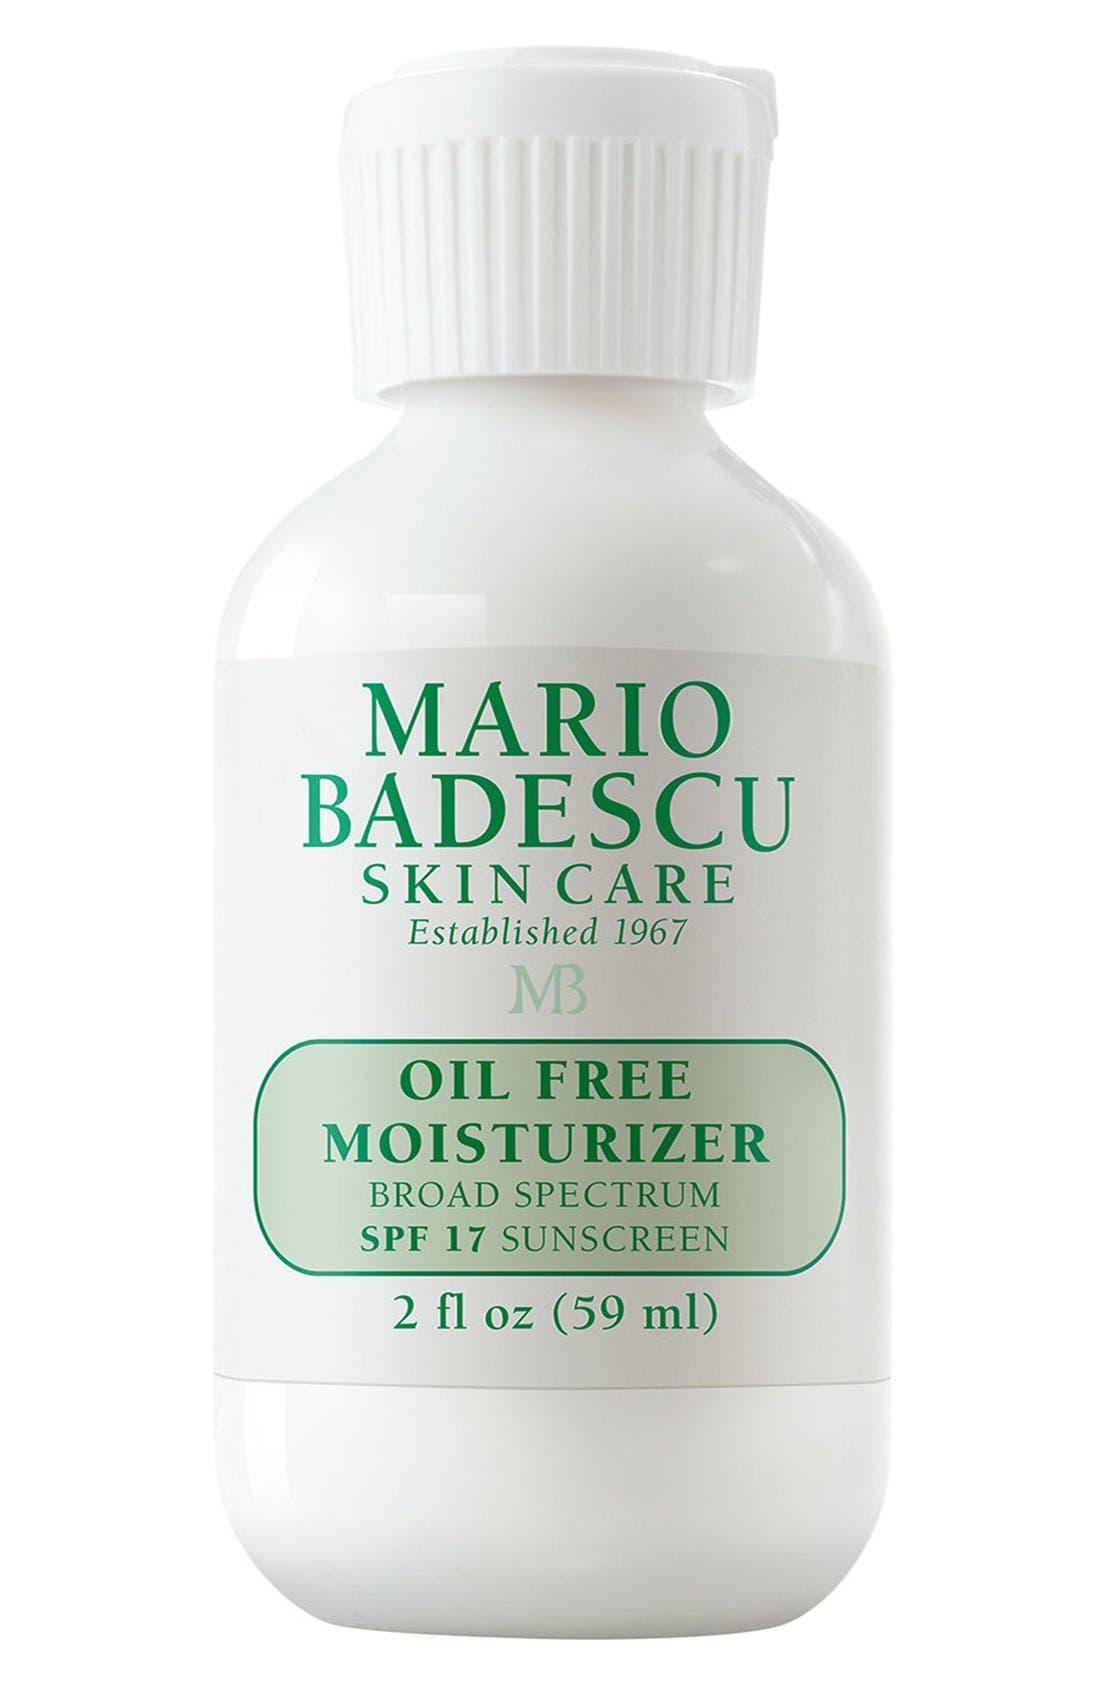 Mario Badescu Oil-Free Moisturizer SPF 17